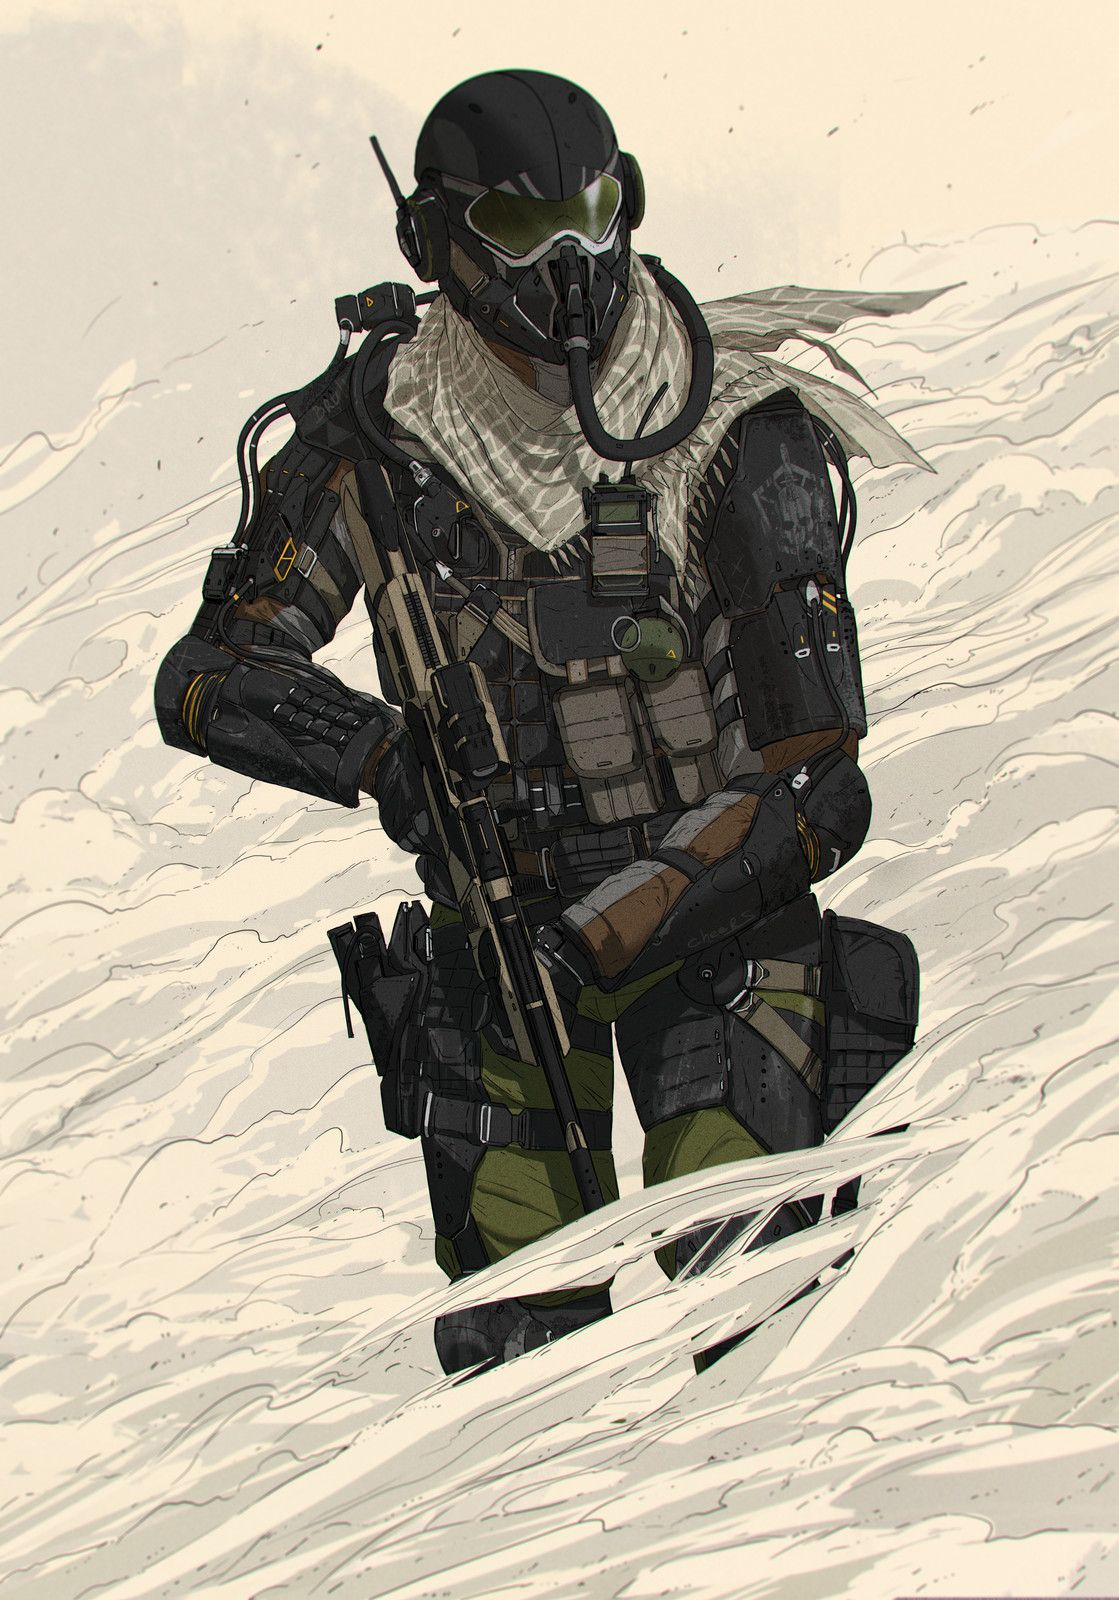 Sand storm, Artojka art group on ArtStation at https://www.artstation.com/artwork/QW5Y3